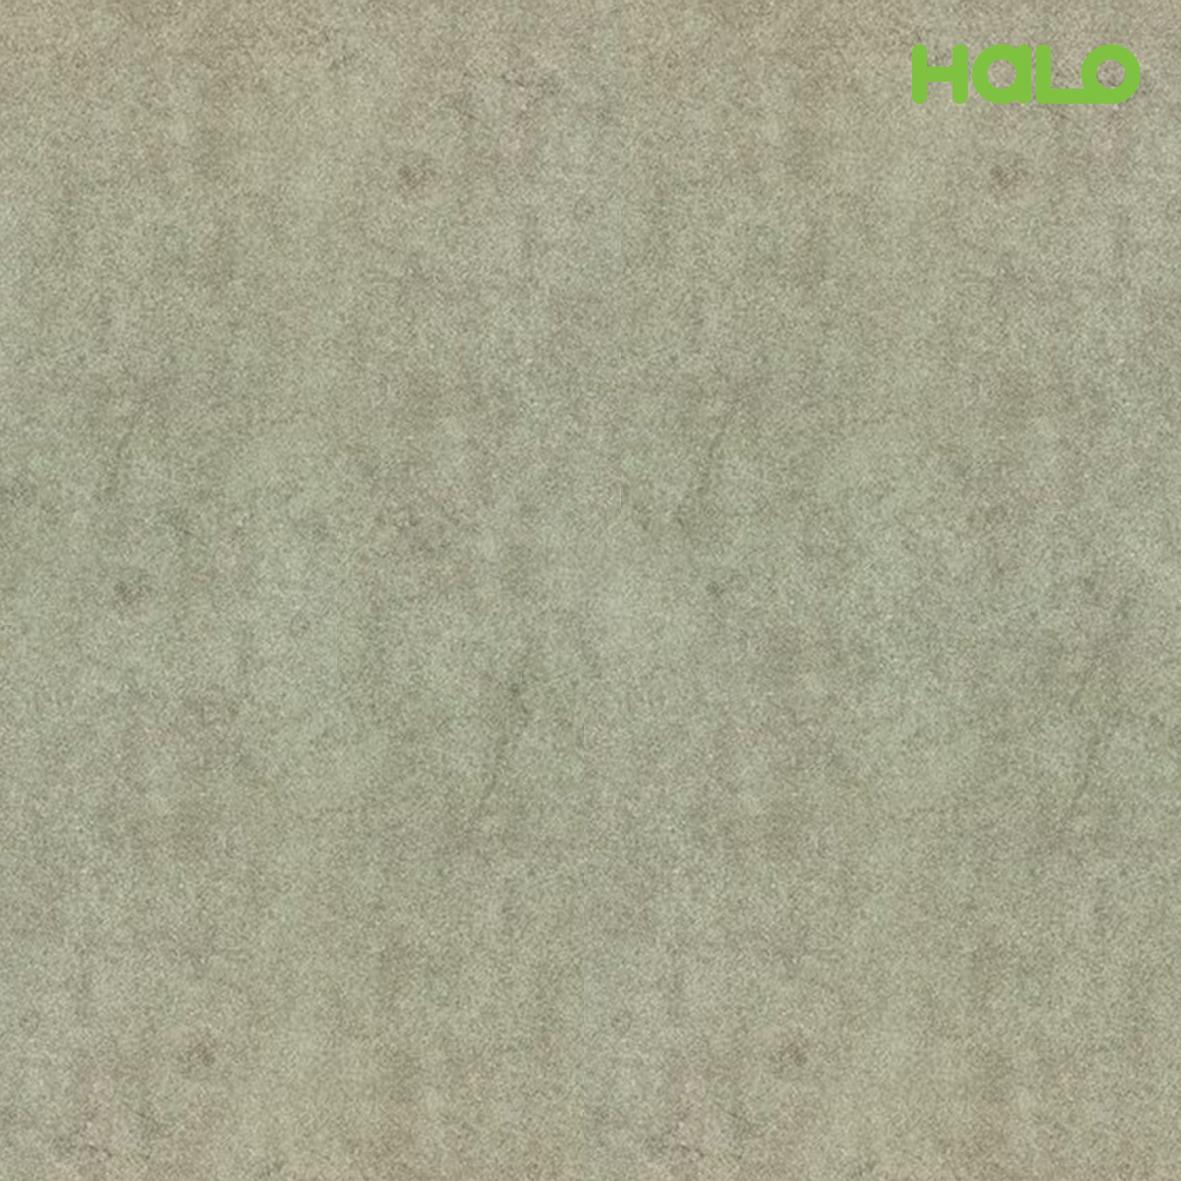 Gạch mờ ánh kim - BTF604